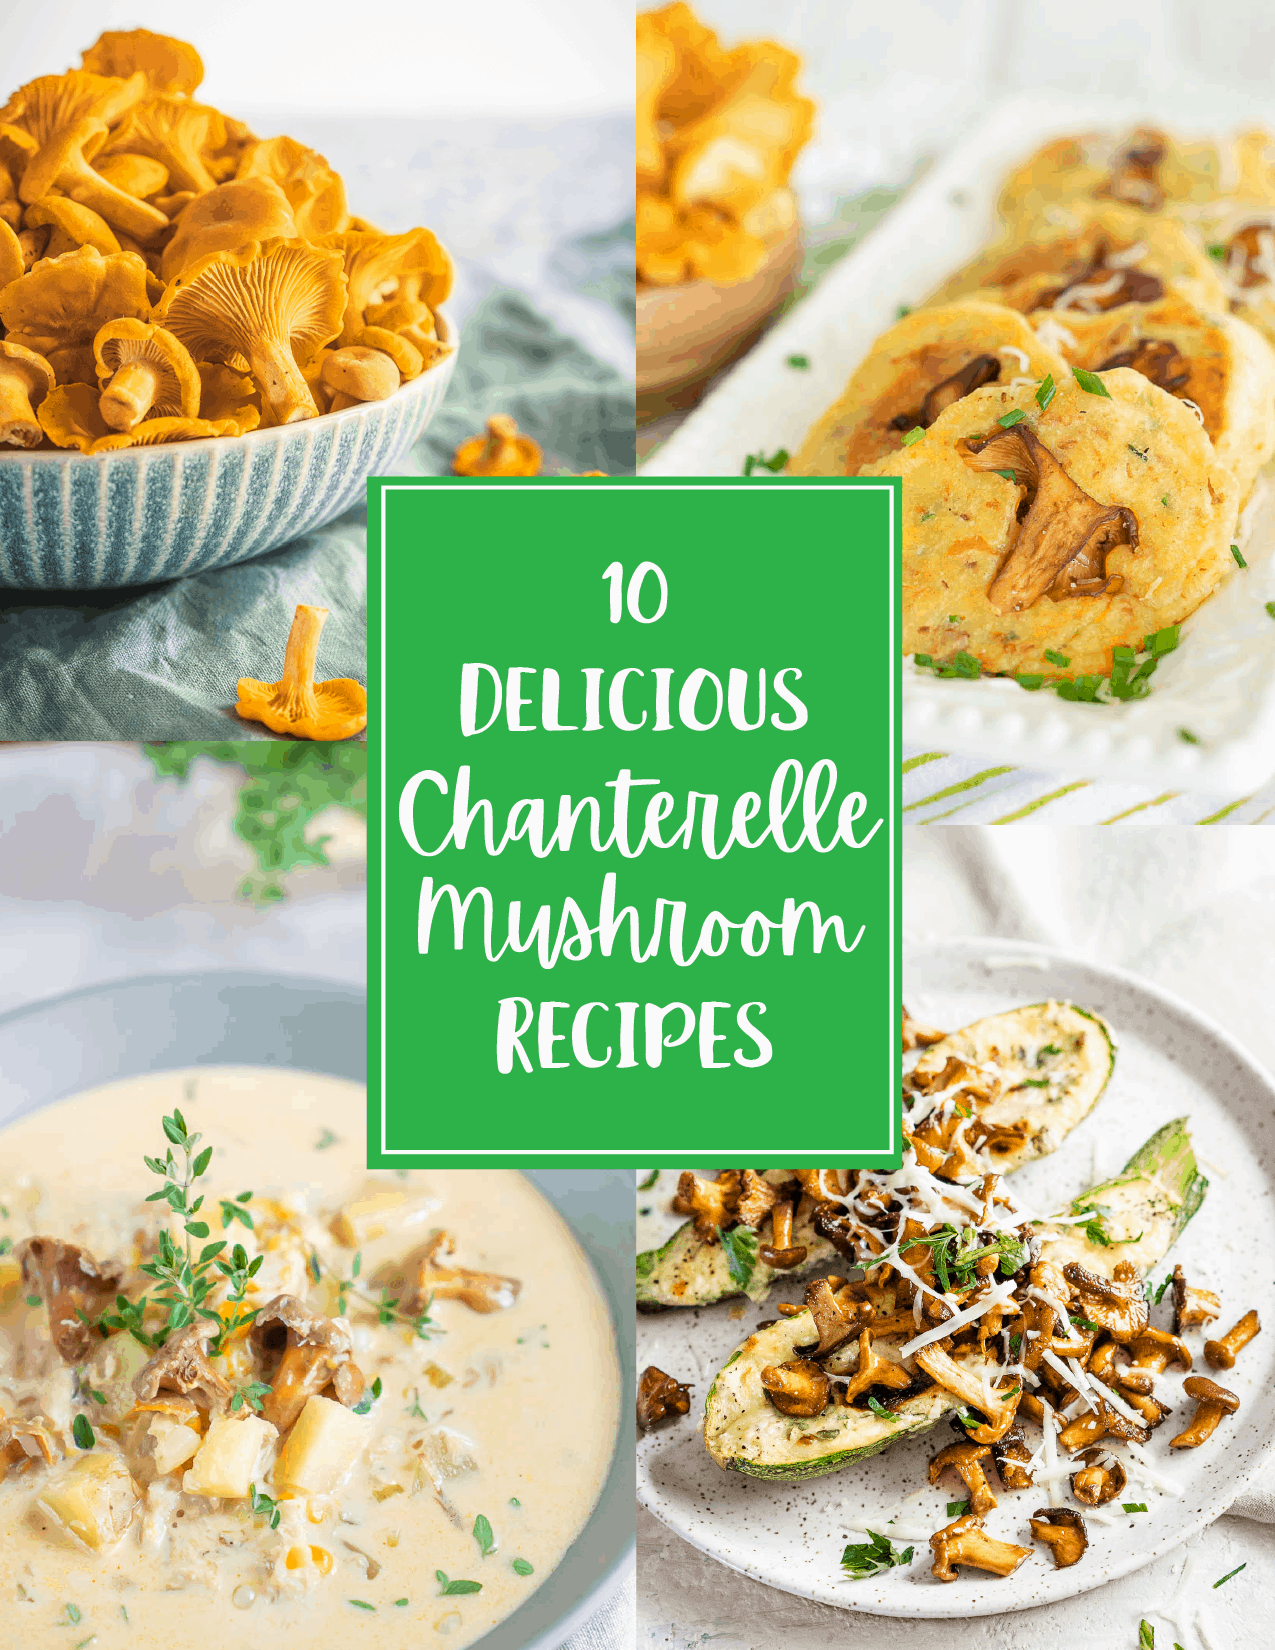 Best Chanterelle Mushroom Recipes Pin